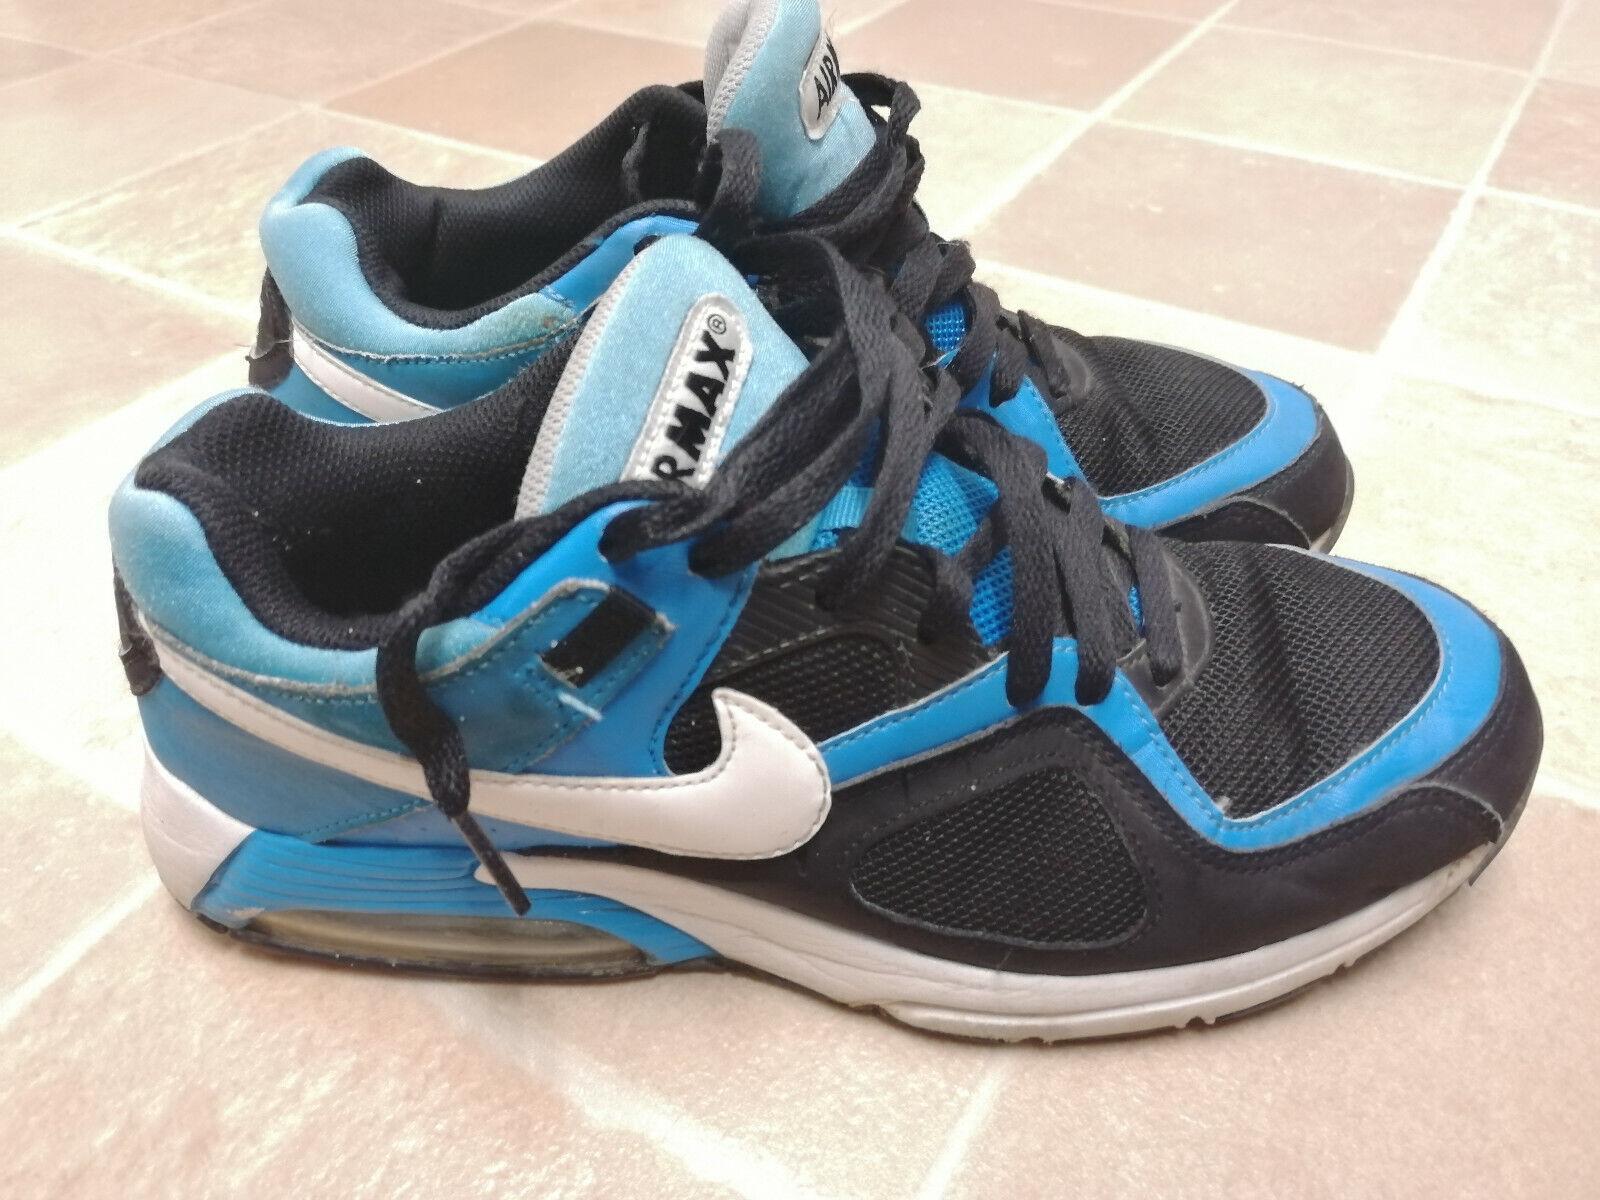 NIKE Air Max Go Strong 418115-014 Blau schwarz Running Turnschuhe Trainers Größe 8.5